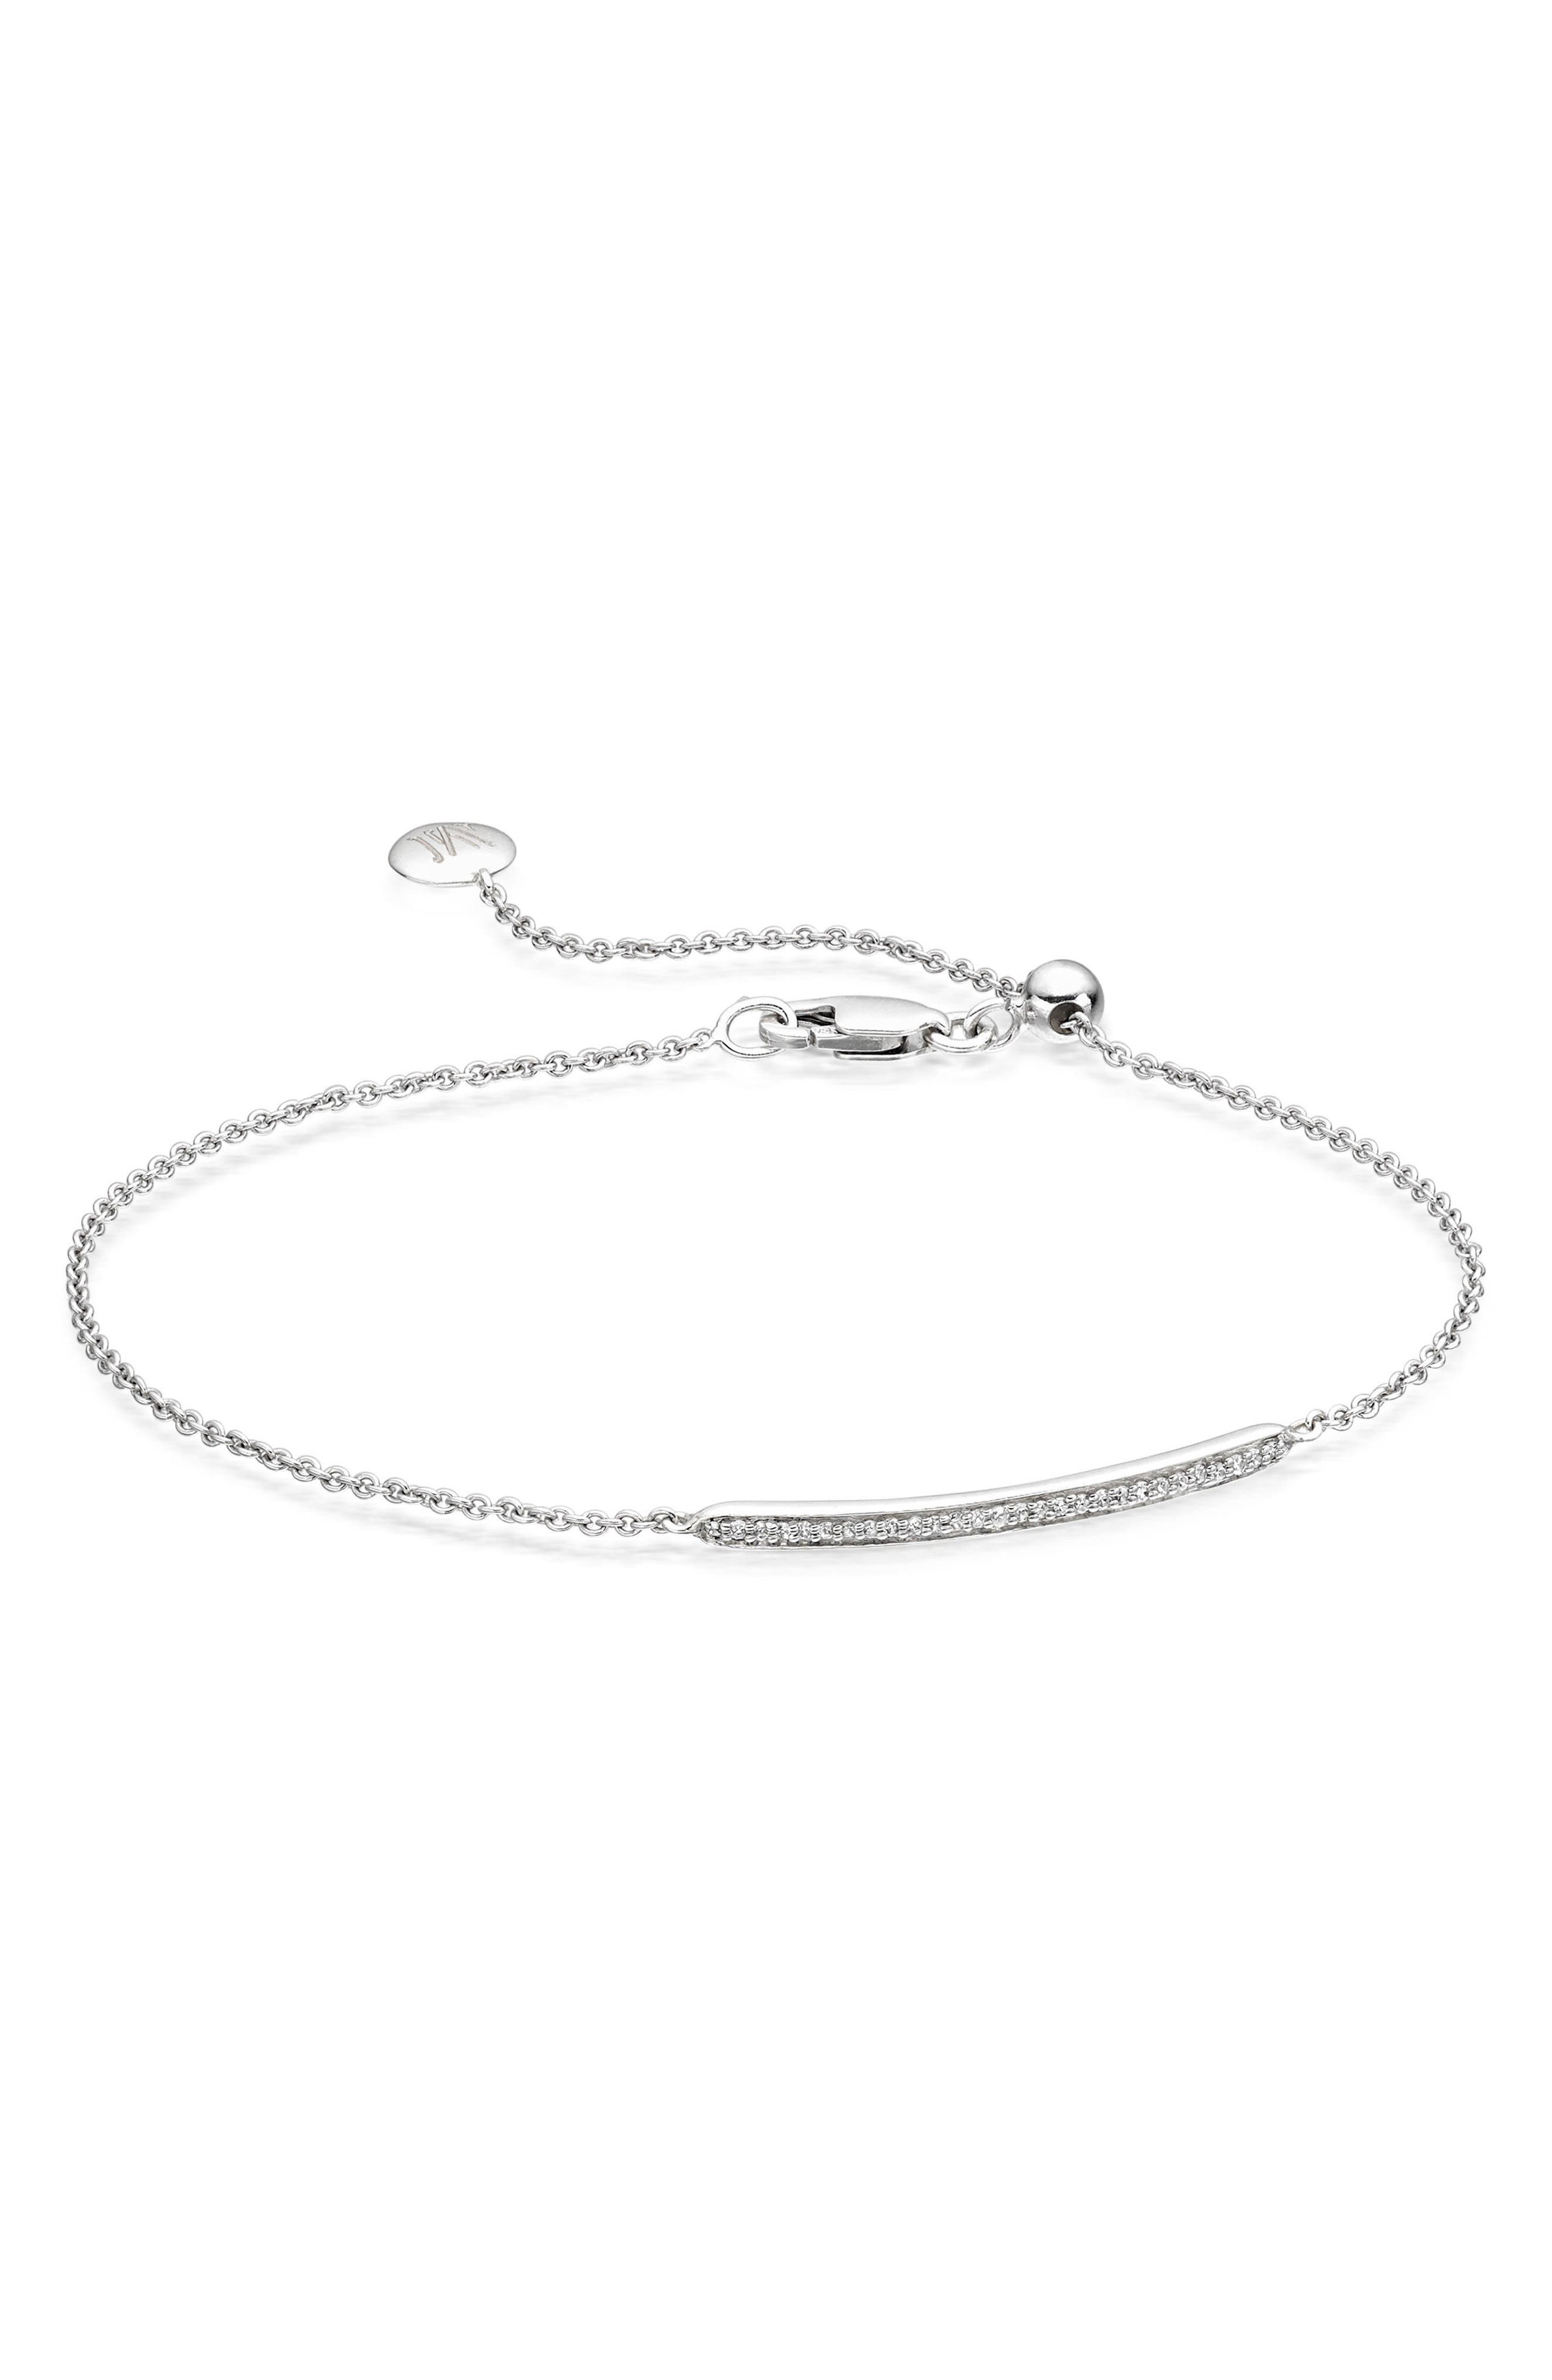 MONICA VINADER, Skinny Diamond Bracelet, Main thumbnail 1, color, SILVER/ DIAMOND